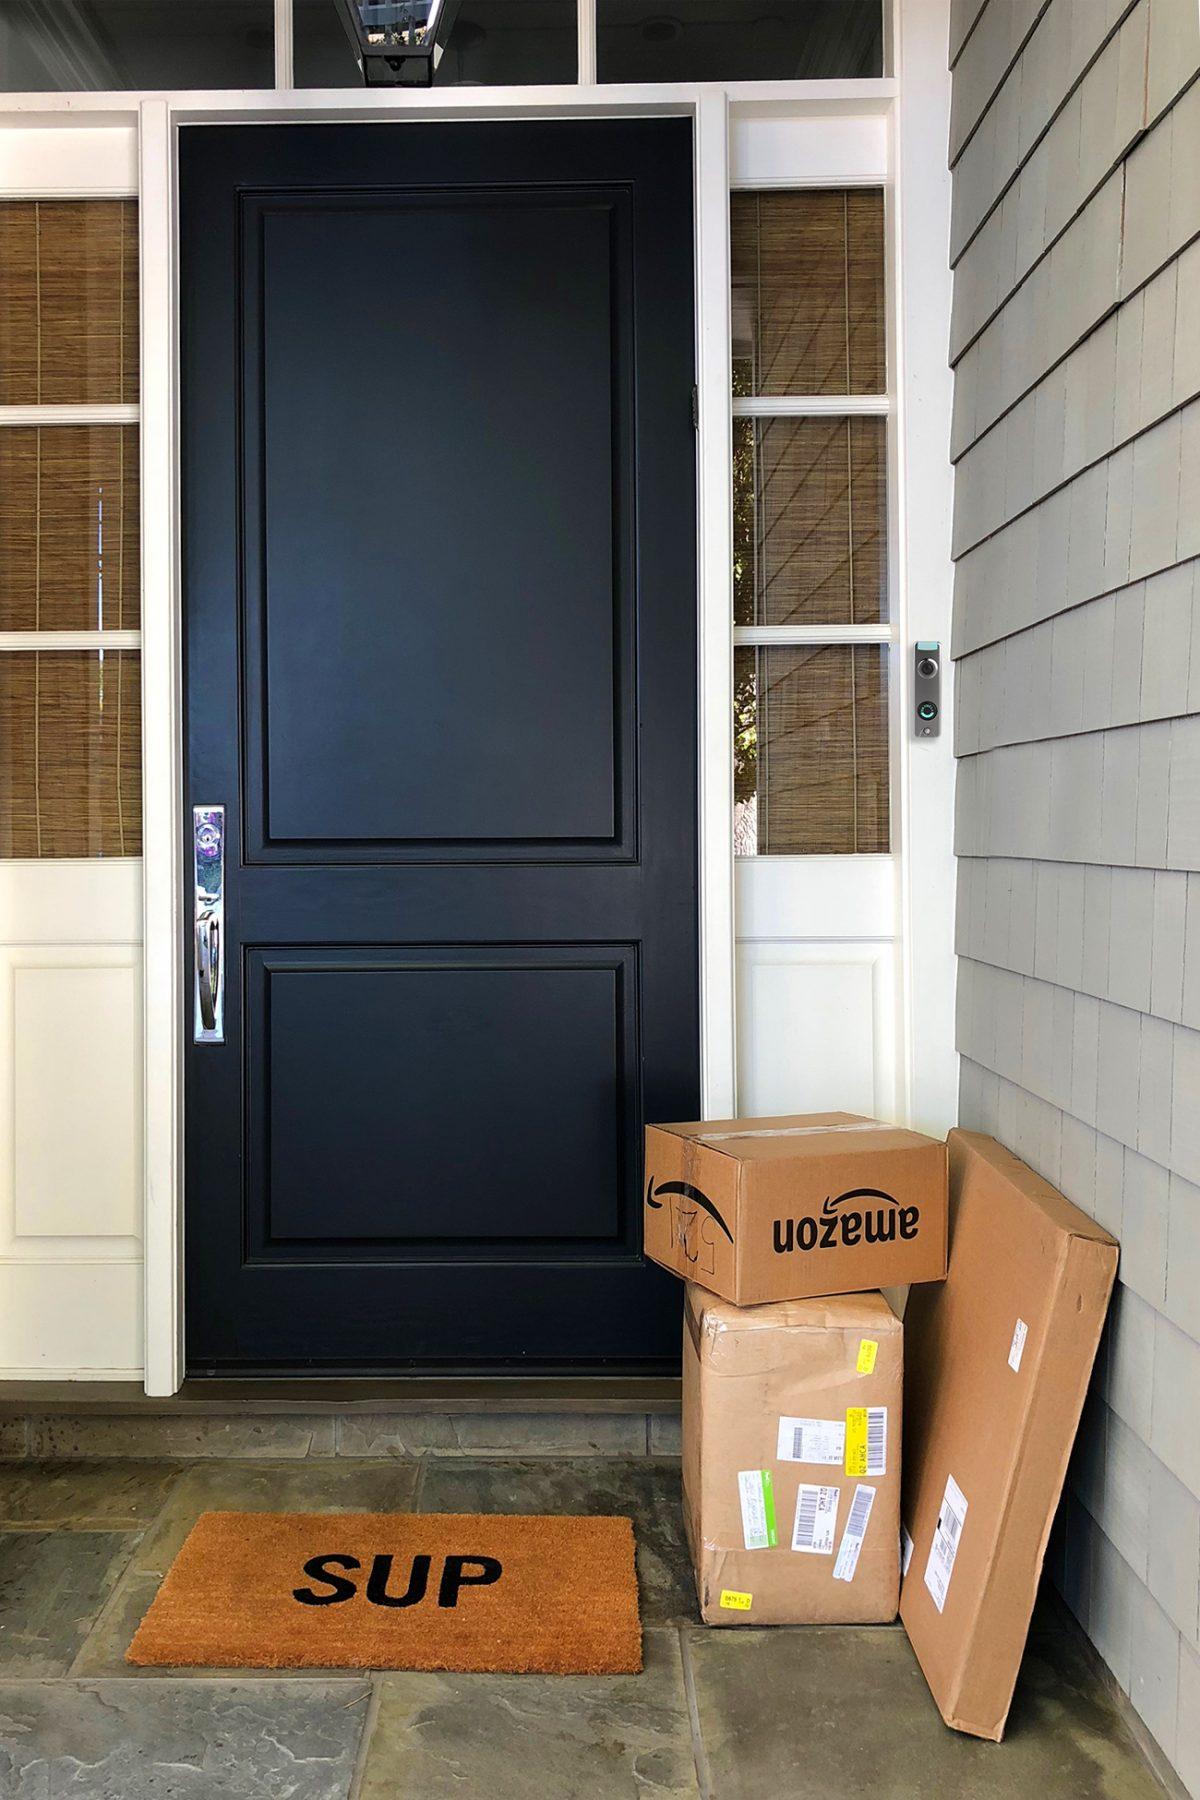 Skybell Video Doorbell: Package Theft